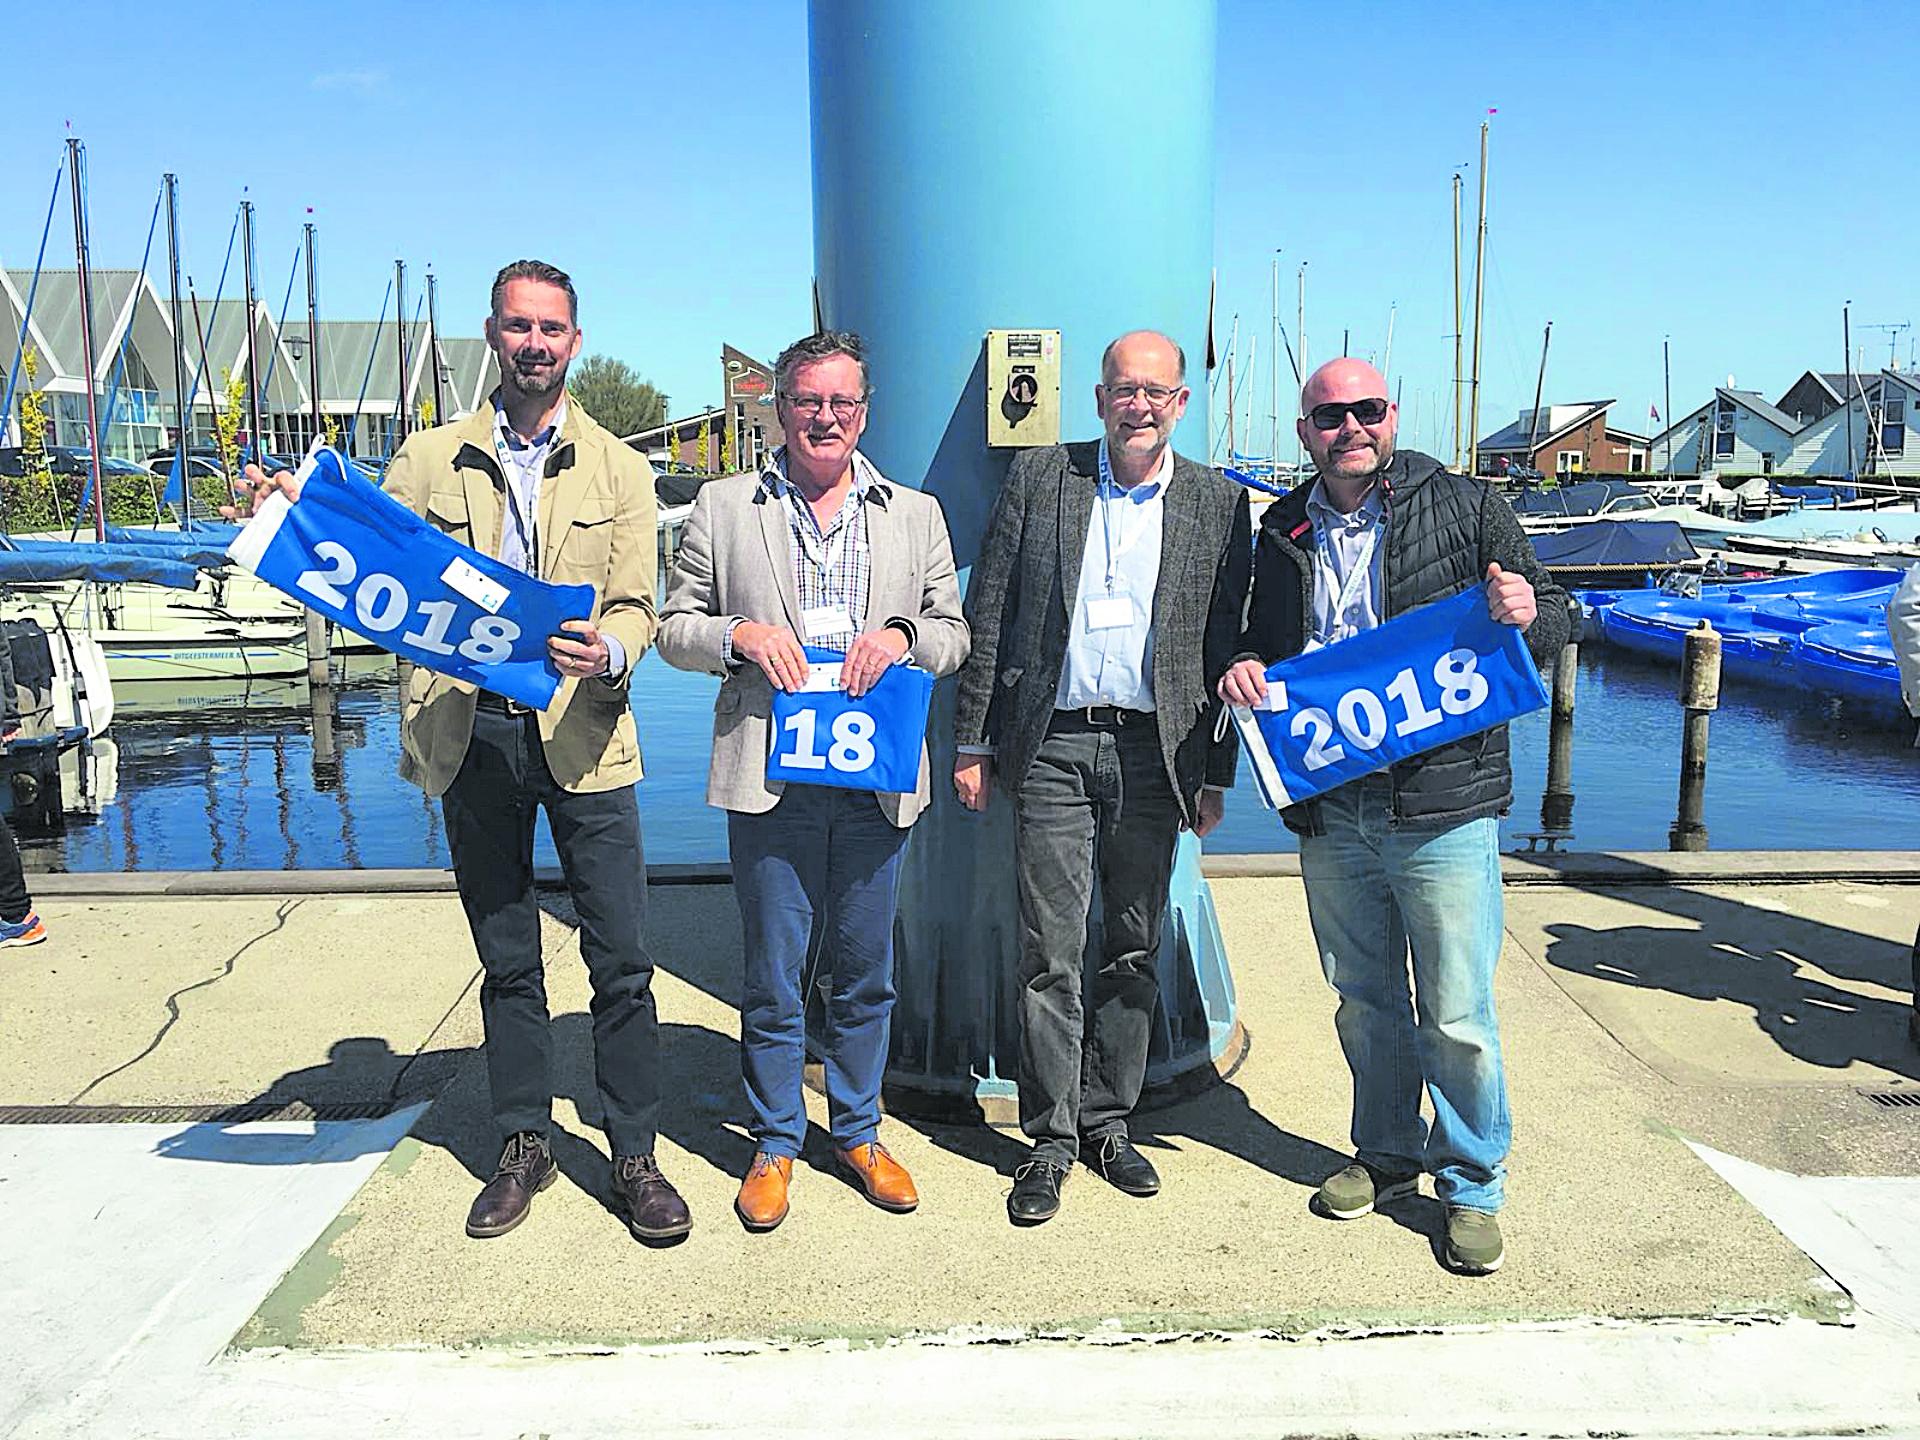 blauwe vlag voor jachthavens Aalsmeer